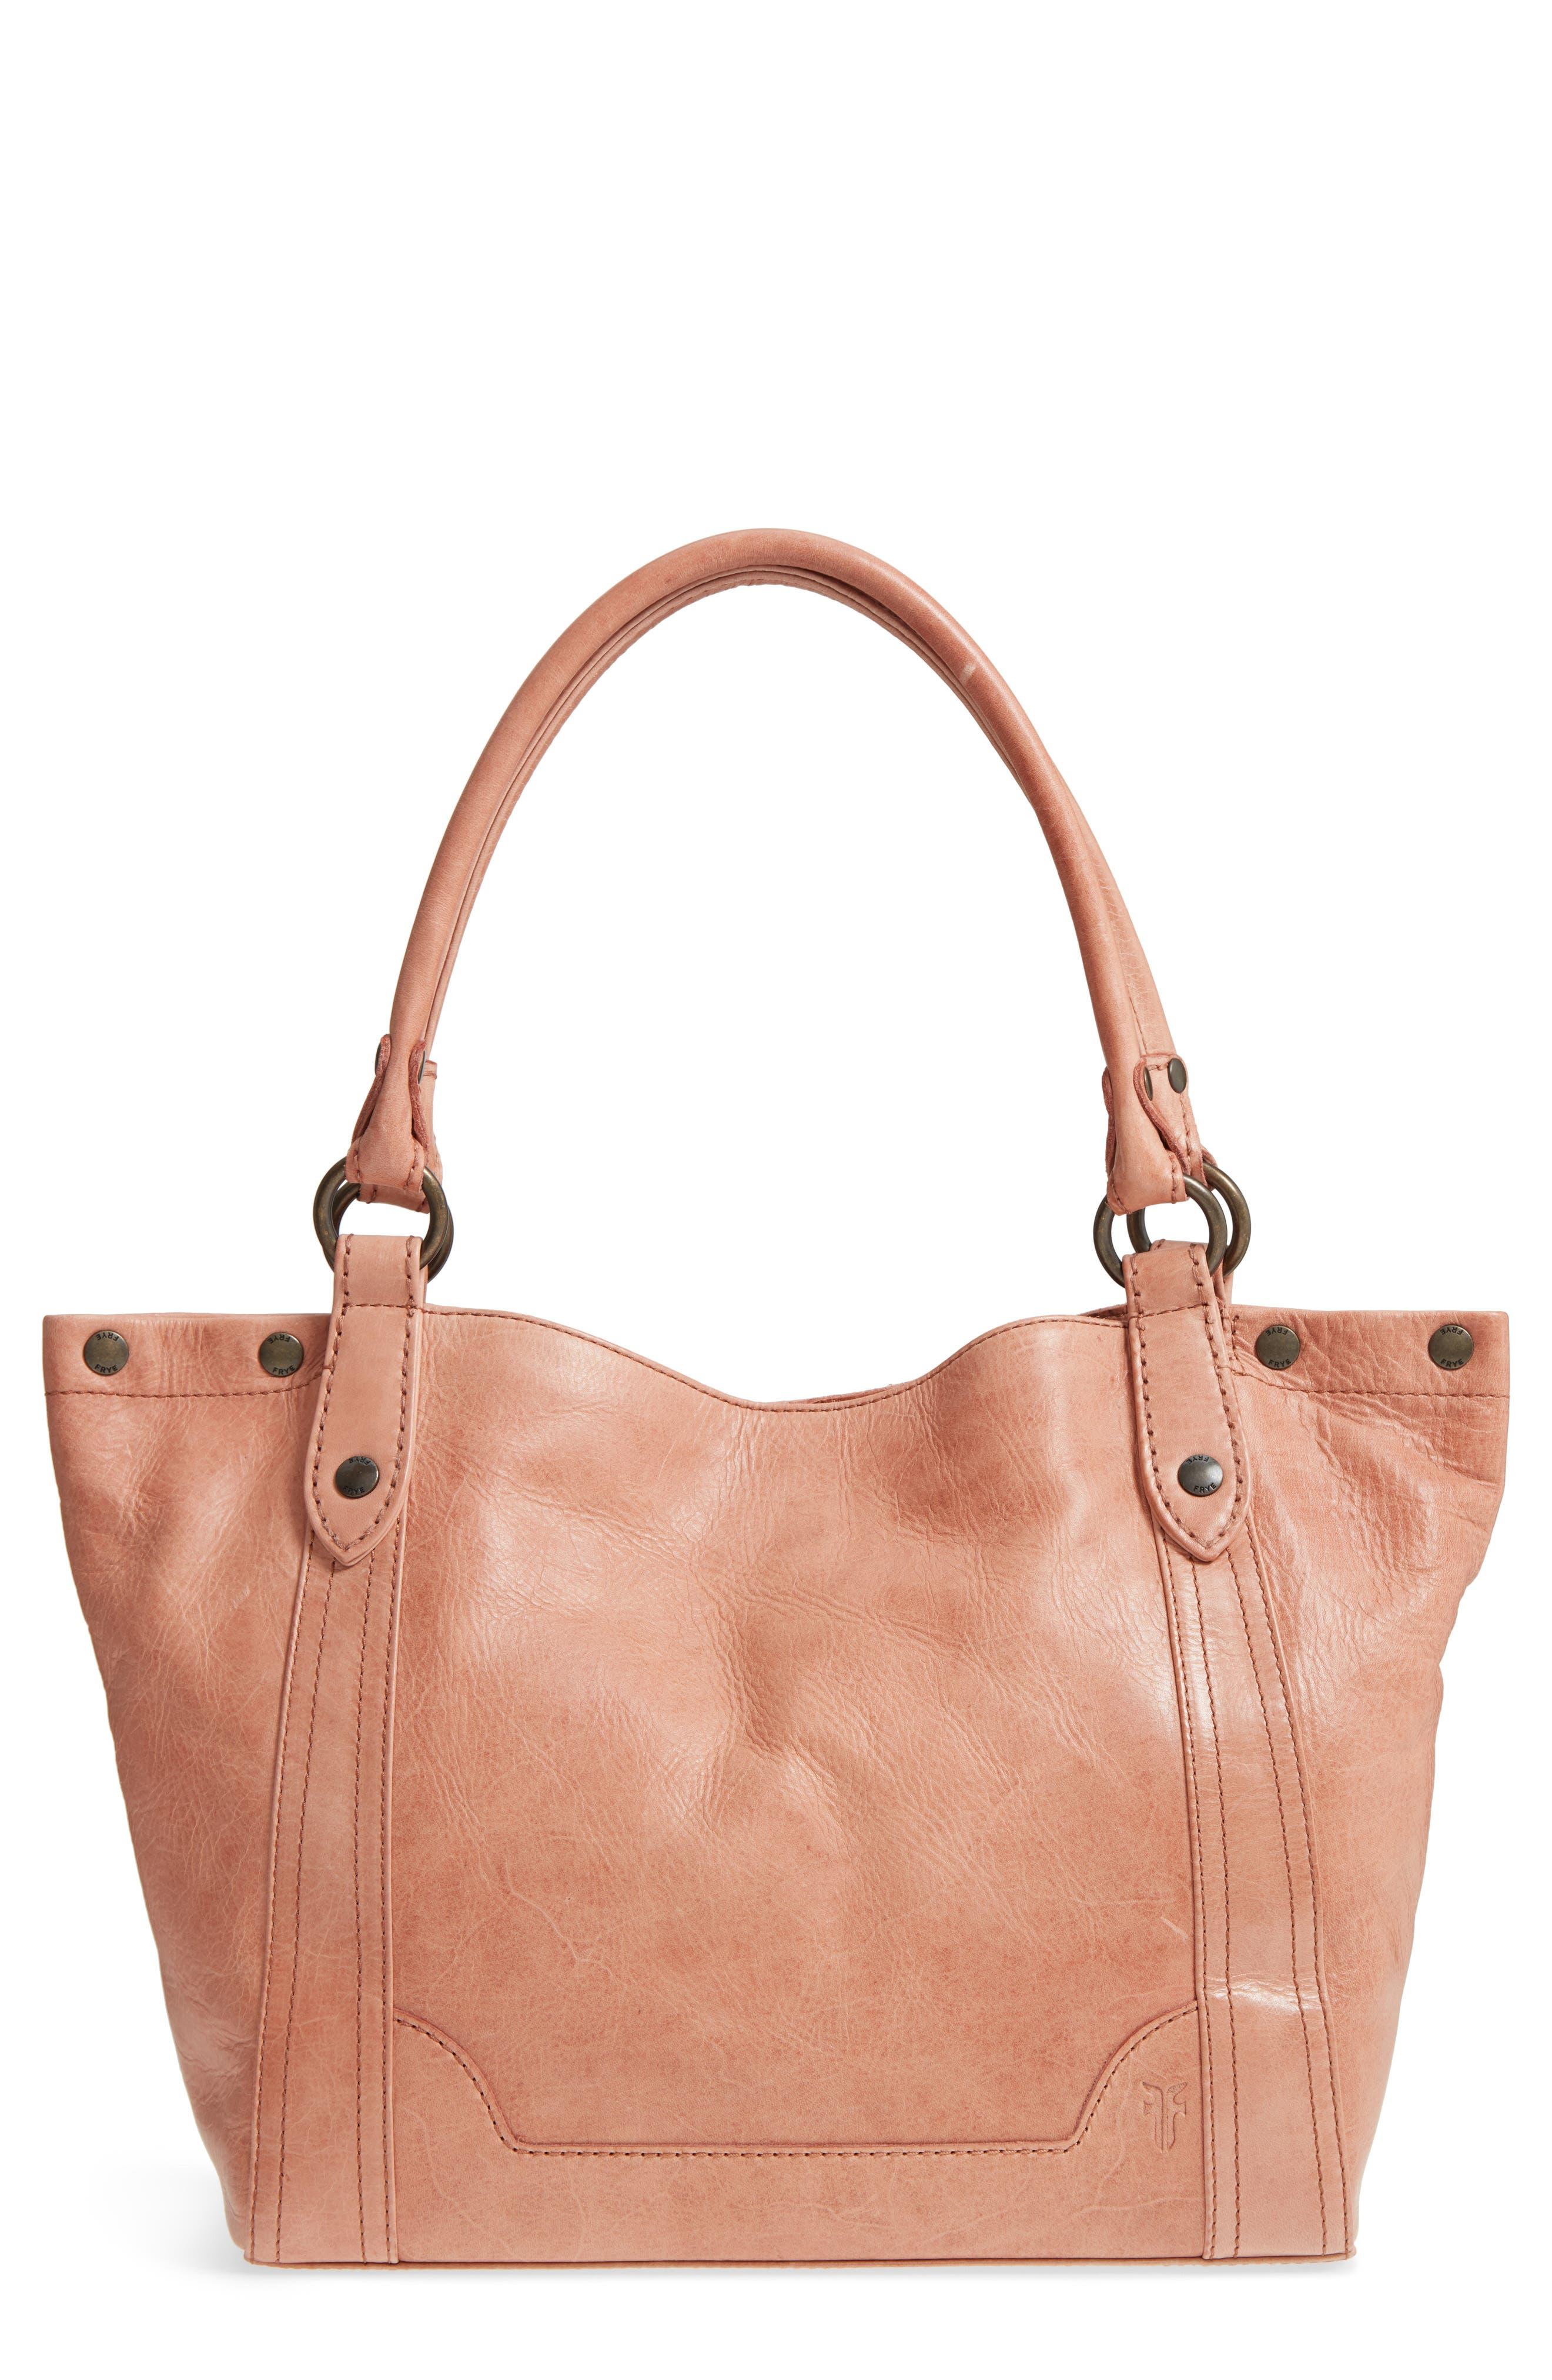 Melissa Leather Shoulder Bag,                             Main thumbnail 1, color,                             DUSTY ROSE